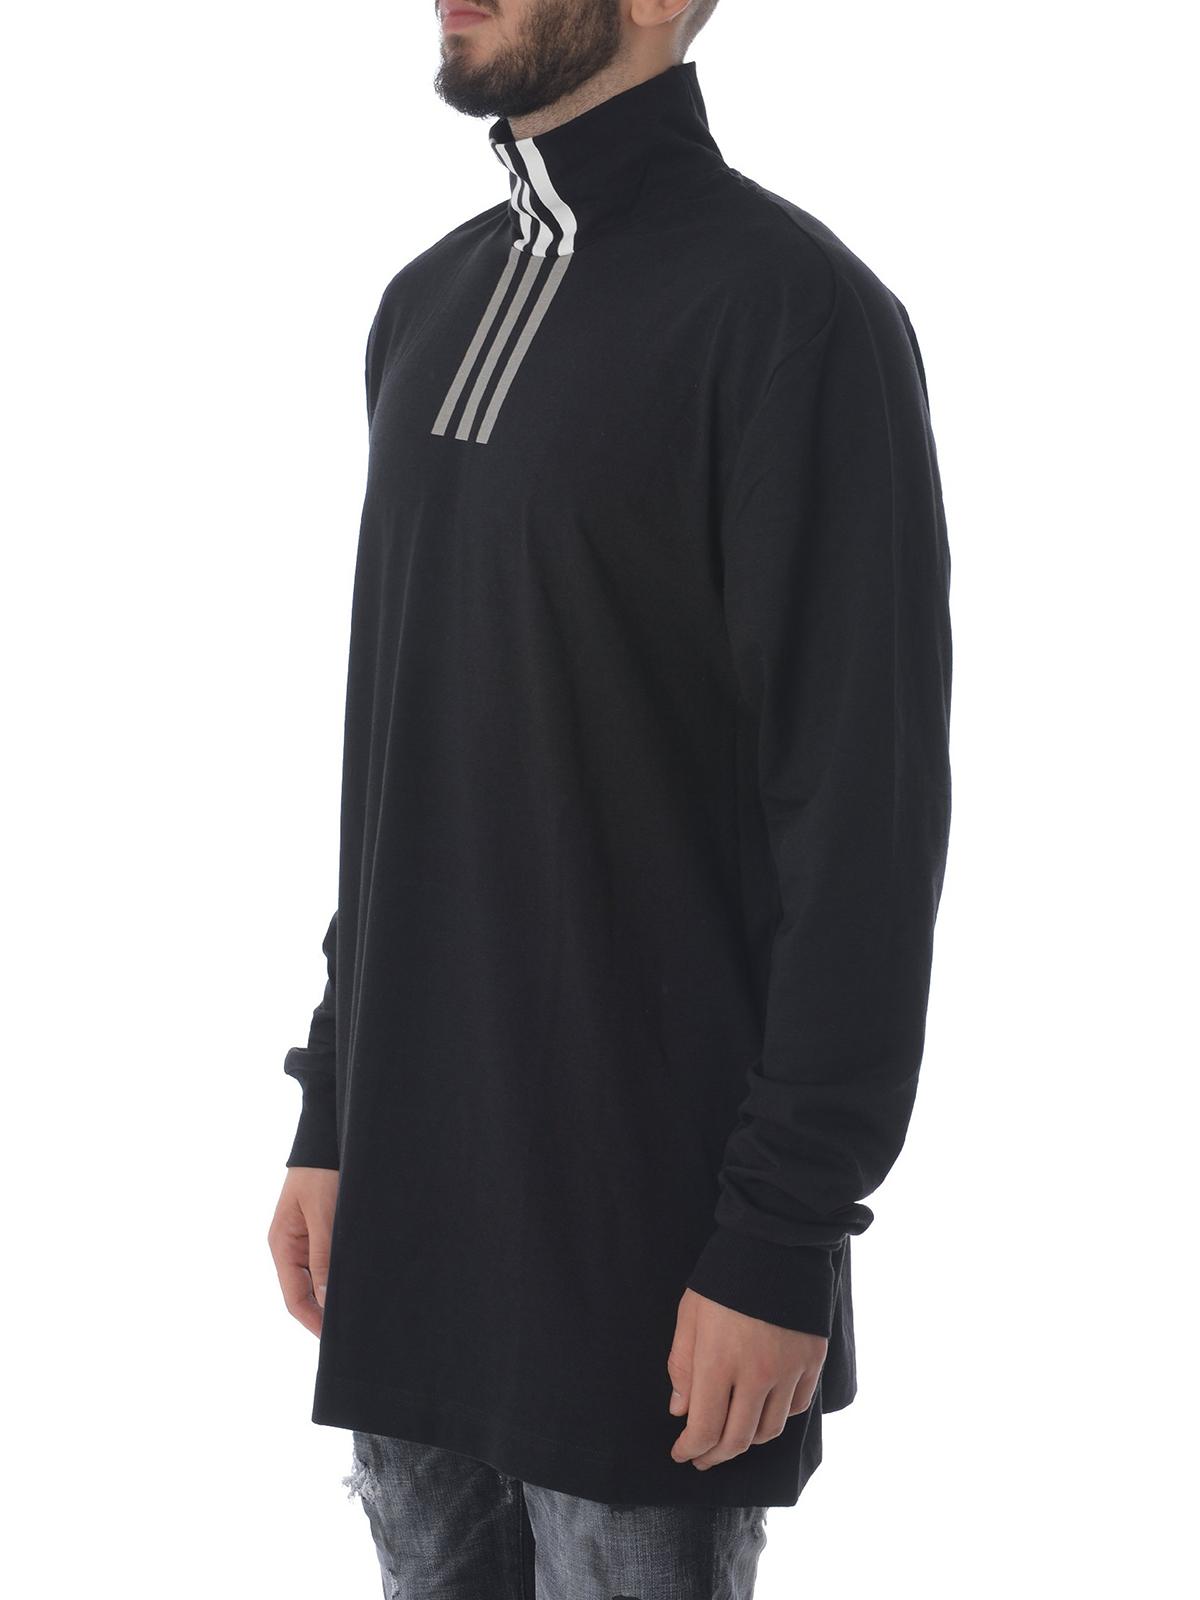 T-shirts Adidas Y-3 - Black jersey cotton long sleeve T-shirt ...